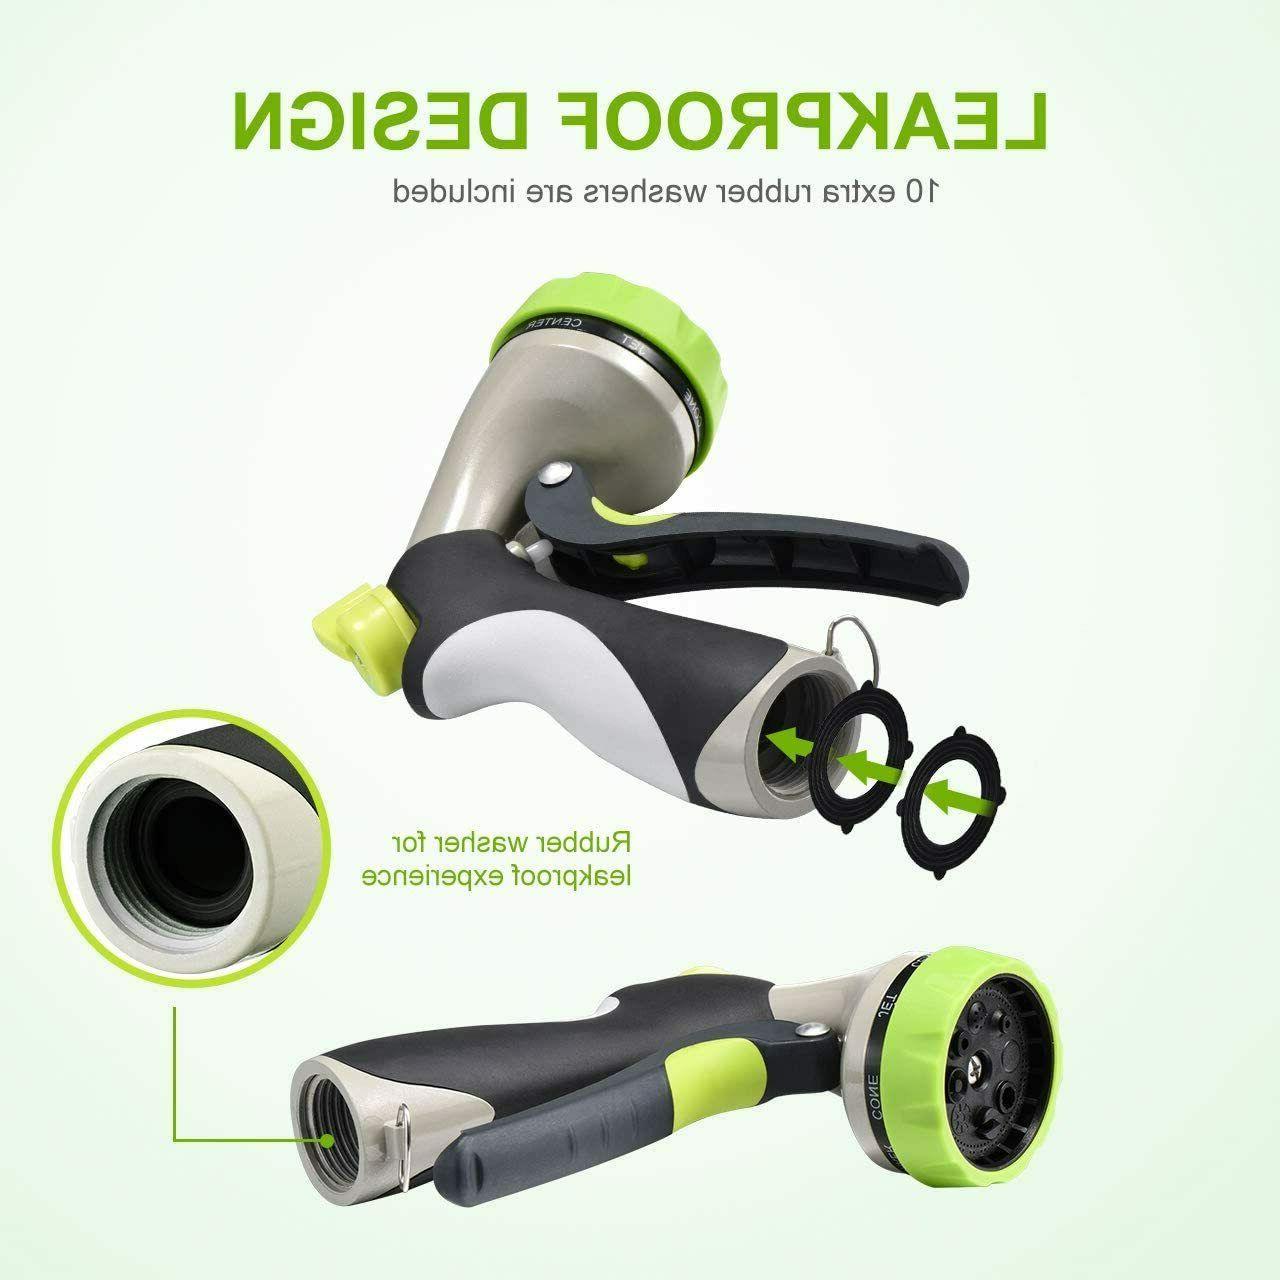 Spray Nozzle for Garden Hose, 8 Spayer, Press Hose